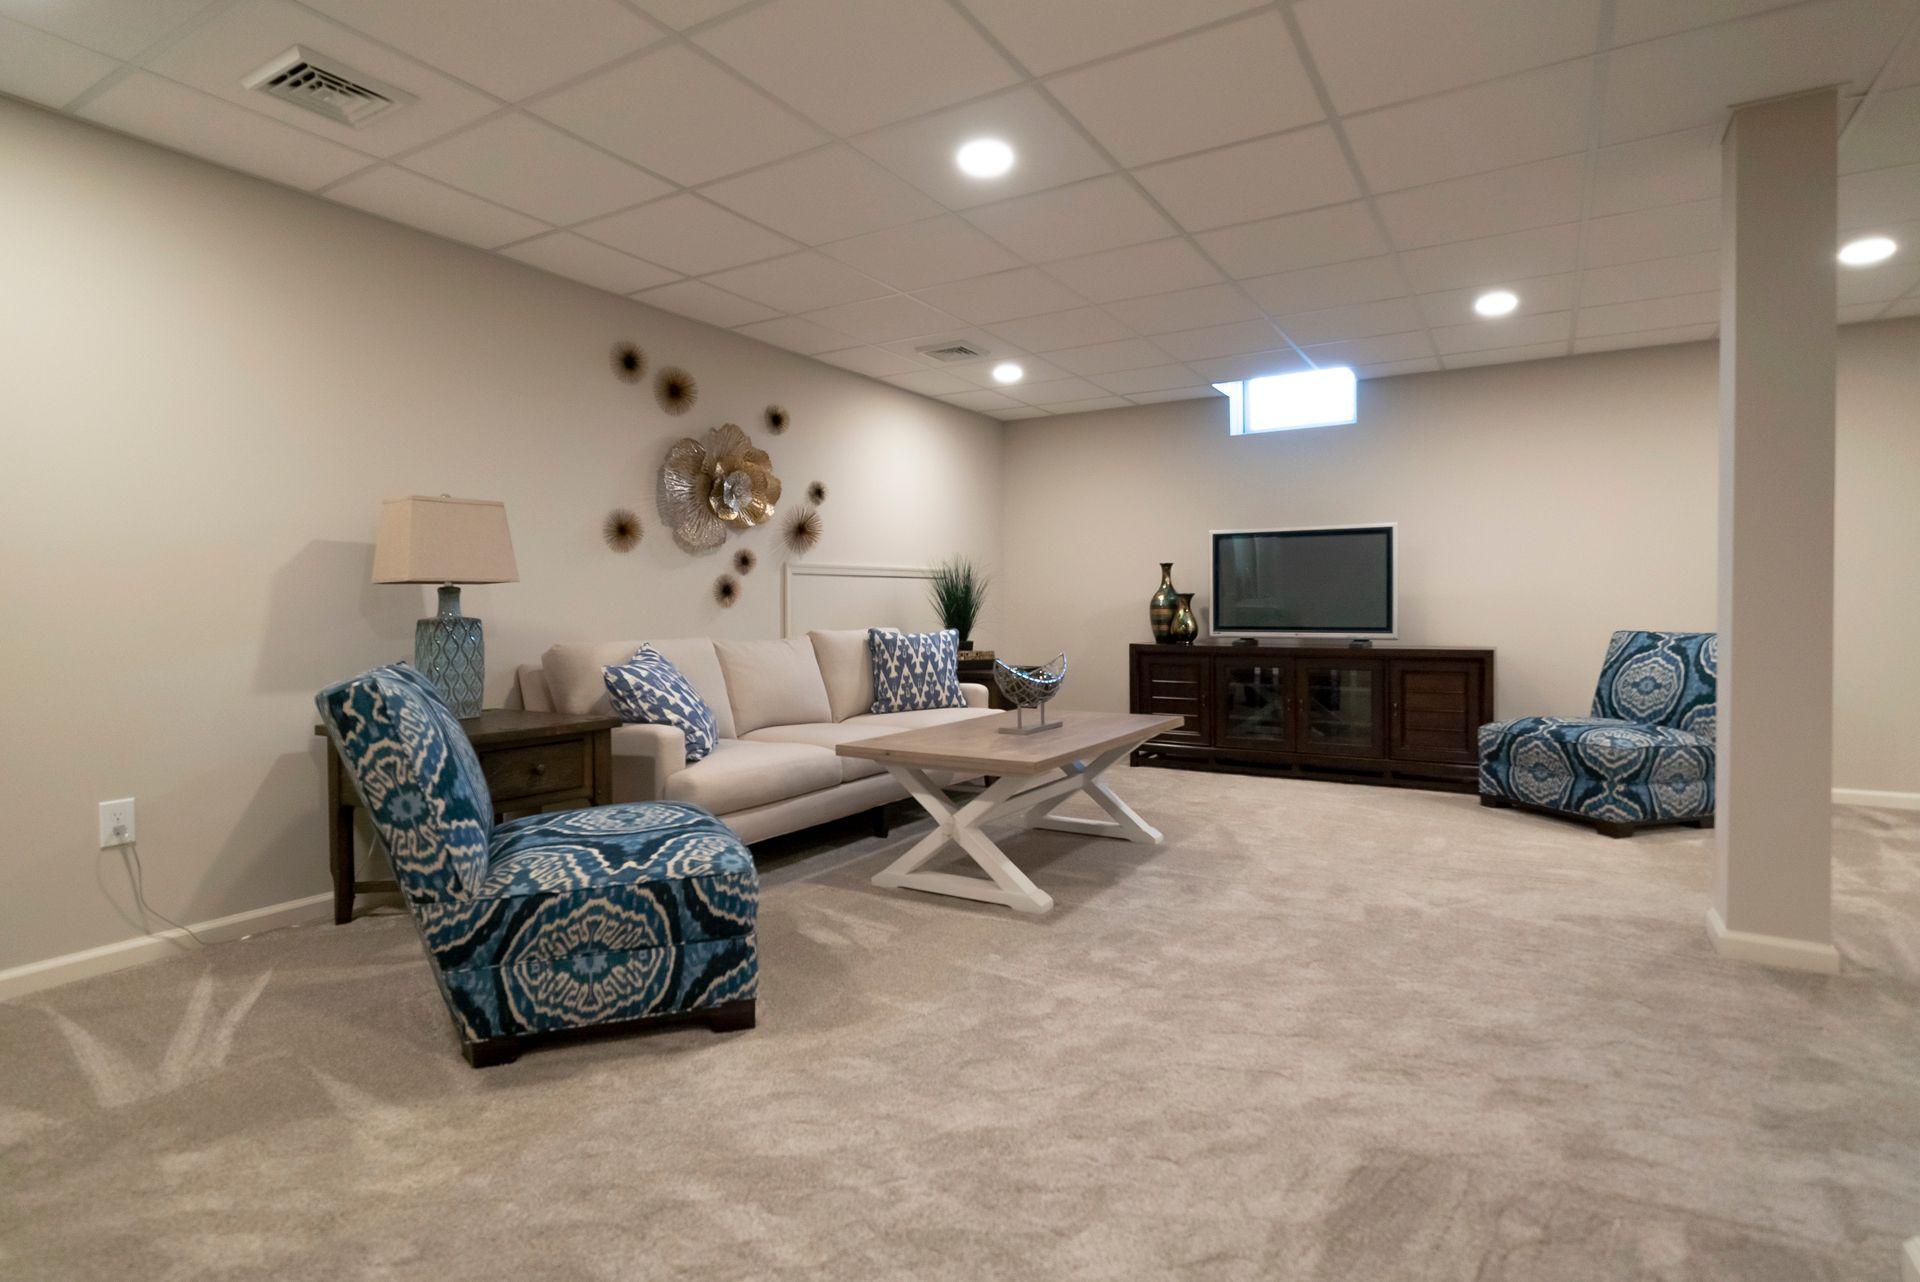 Living Area featured in the Breckenridge Farmhouse By Tuskes Homes in Scranton-Wilkes-Barre, PA